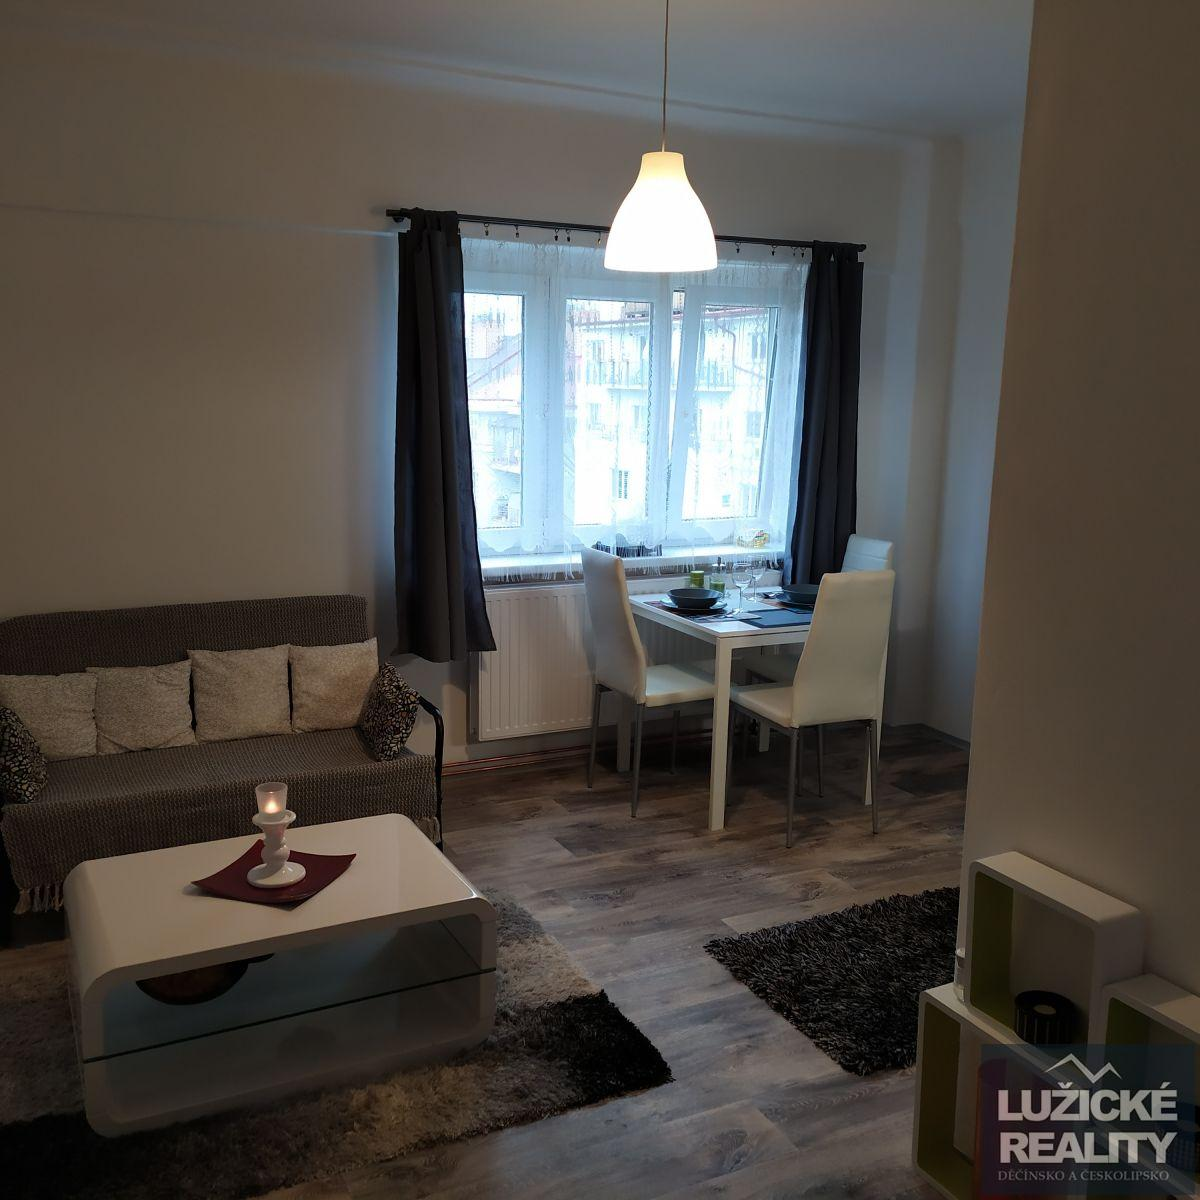 Pronájem bytu 2+kk, 51 m2 ulice Viklefova